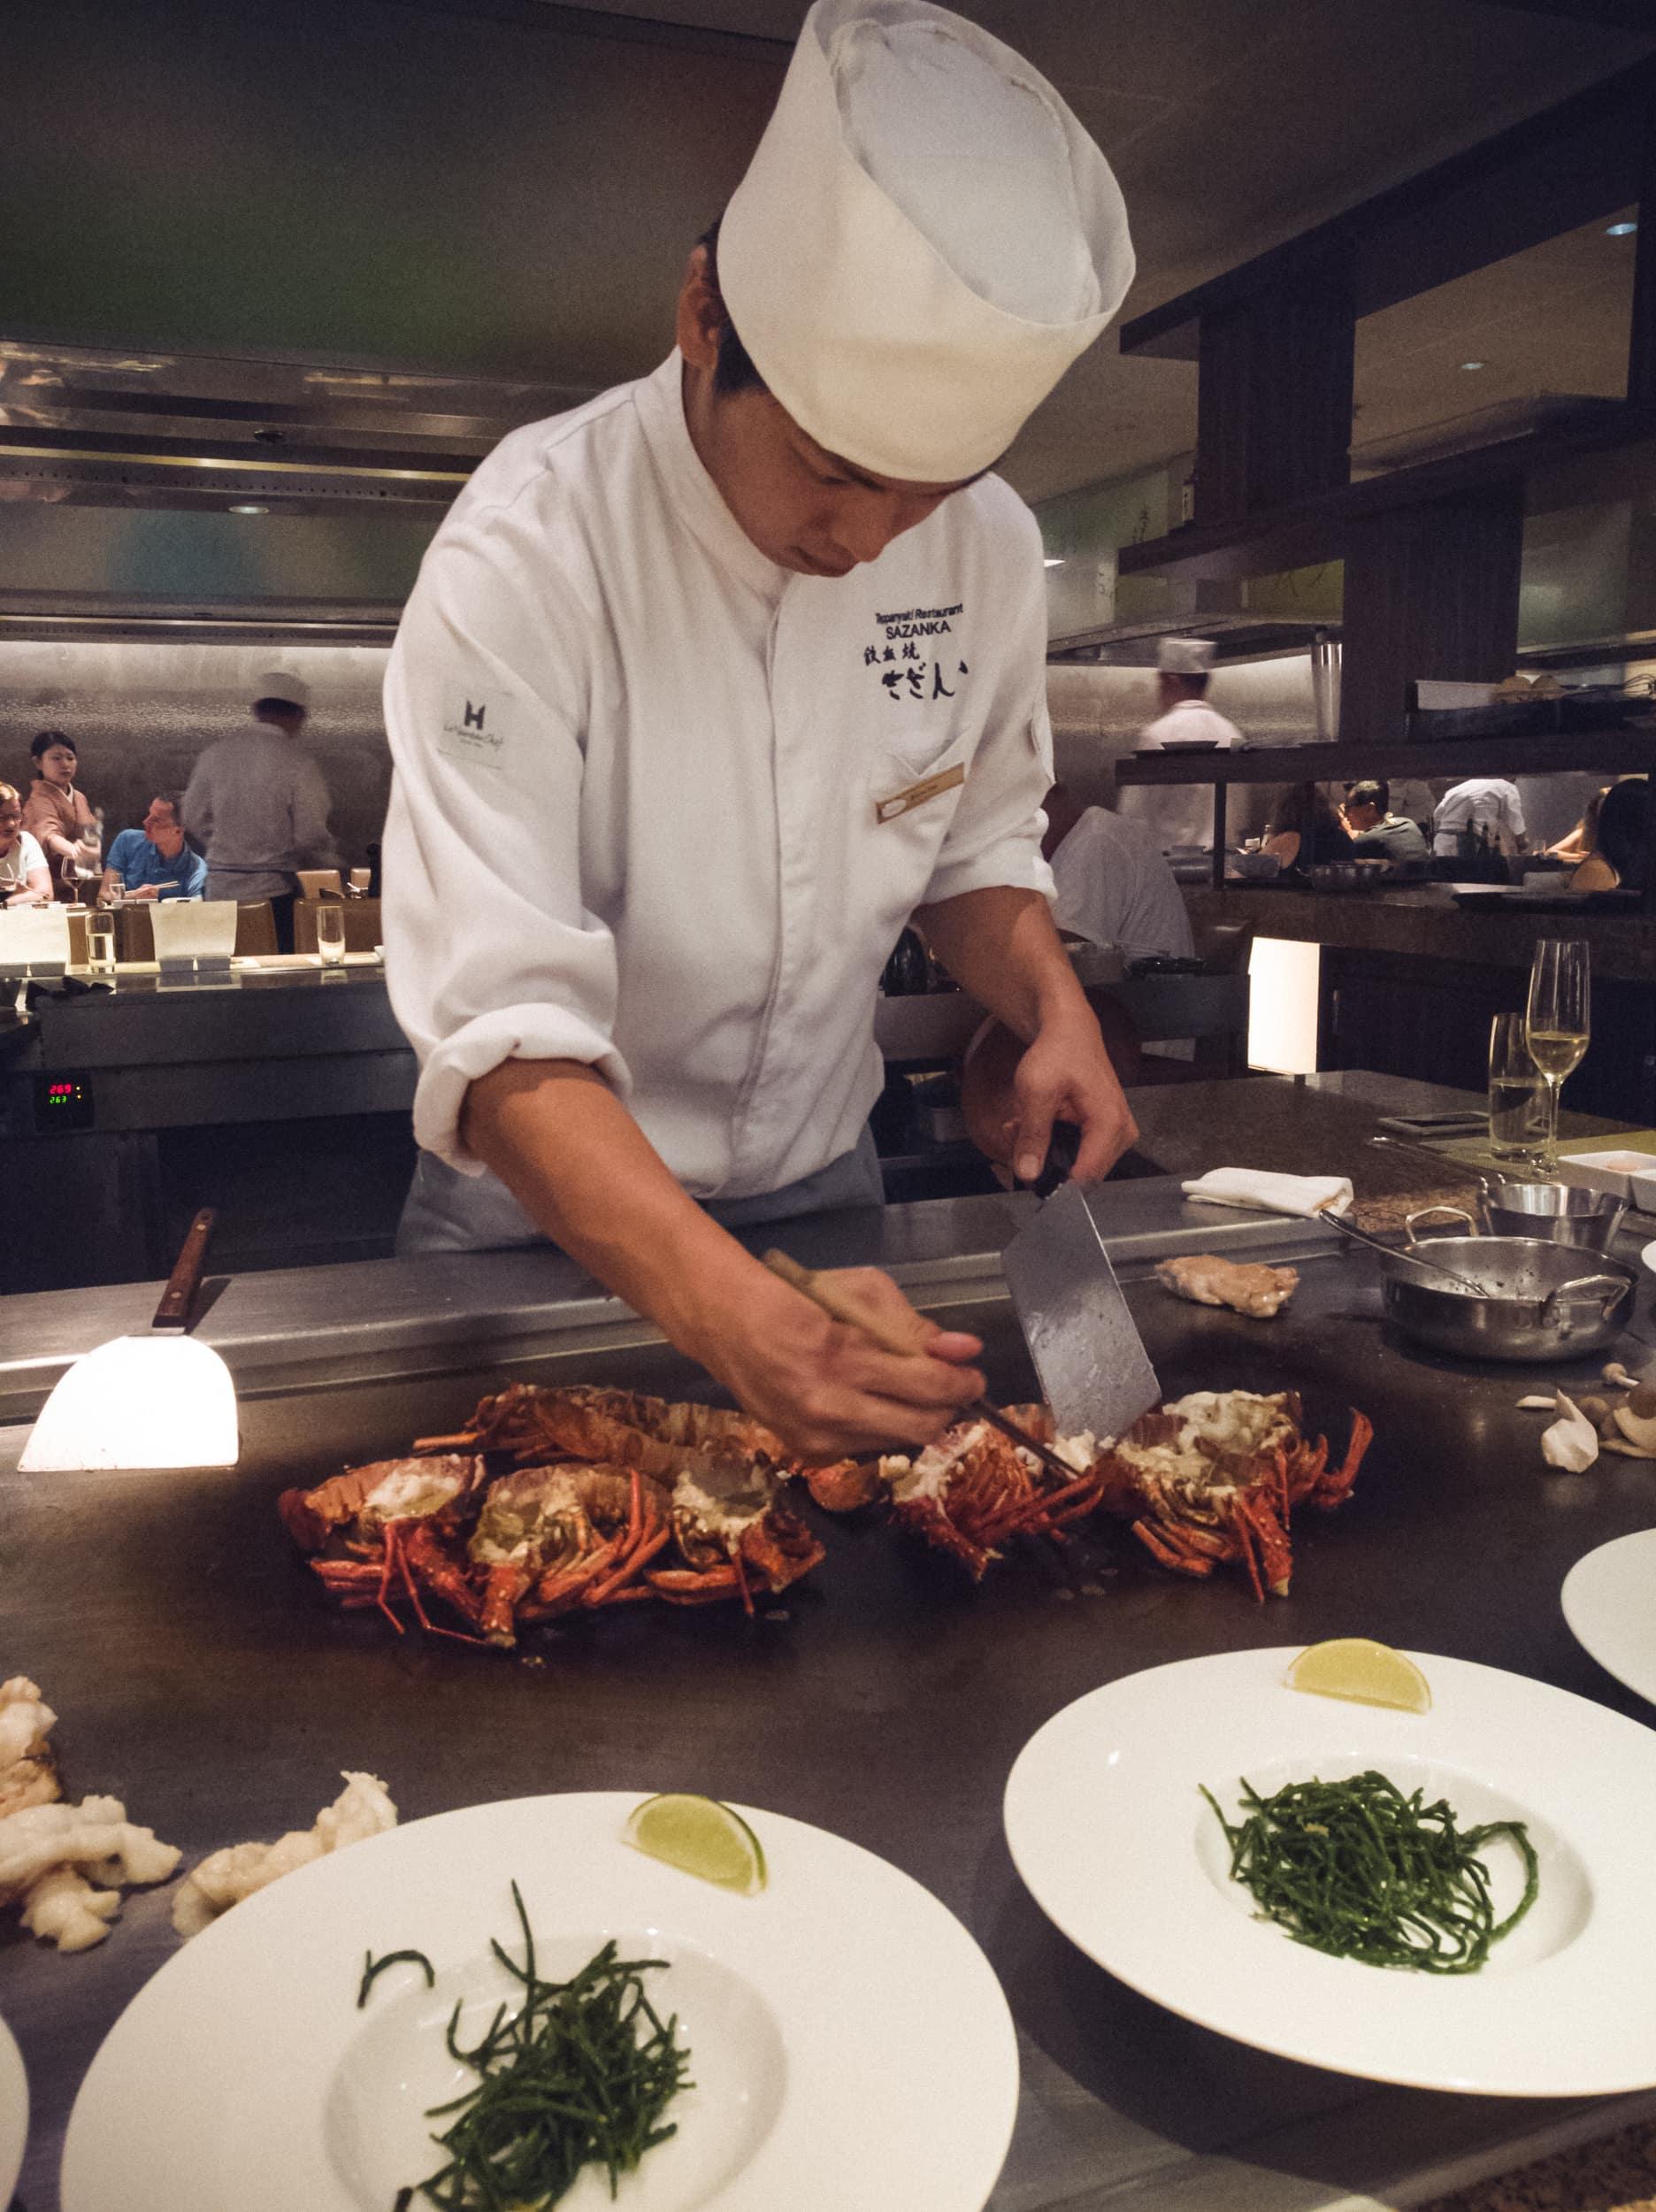 Japanischer Koch bereitet Hummer vor.